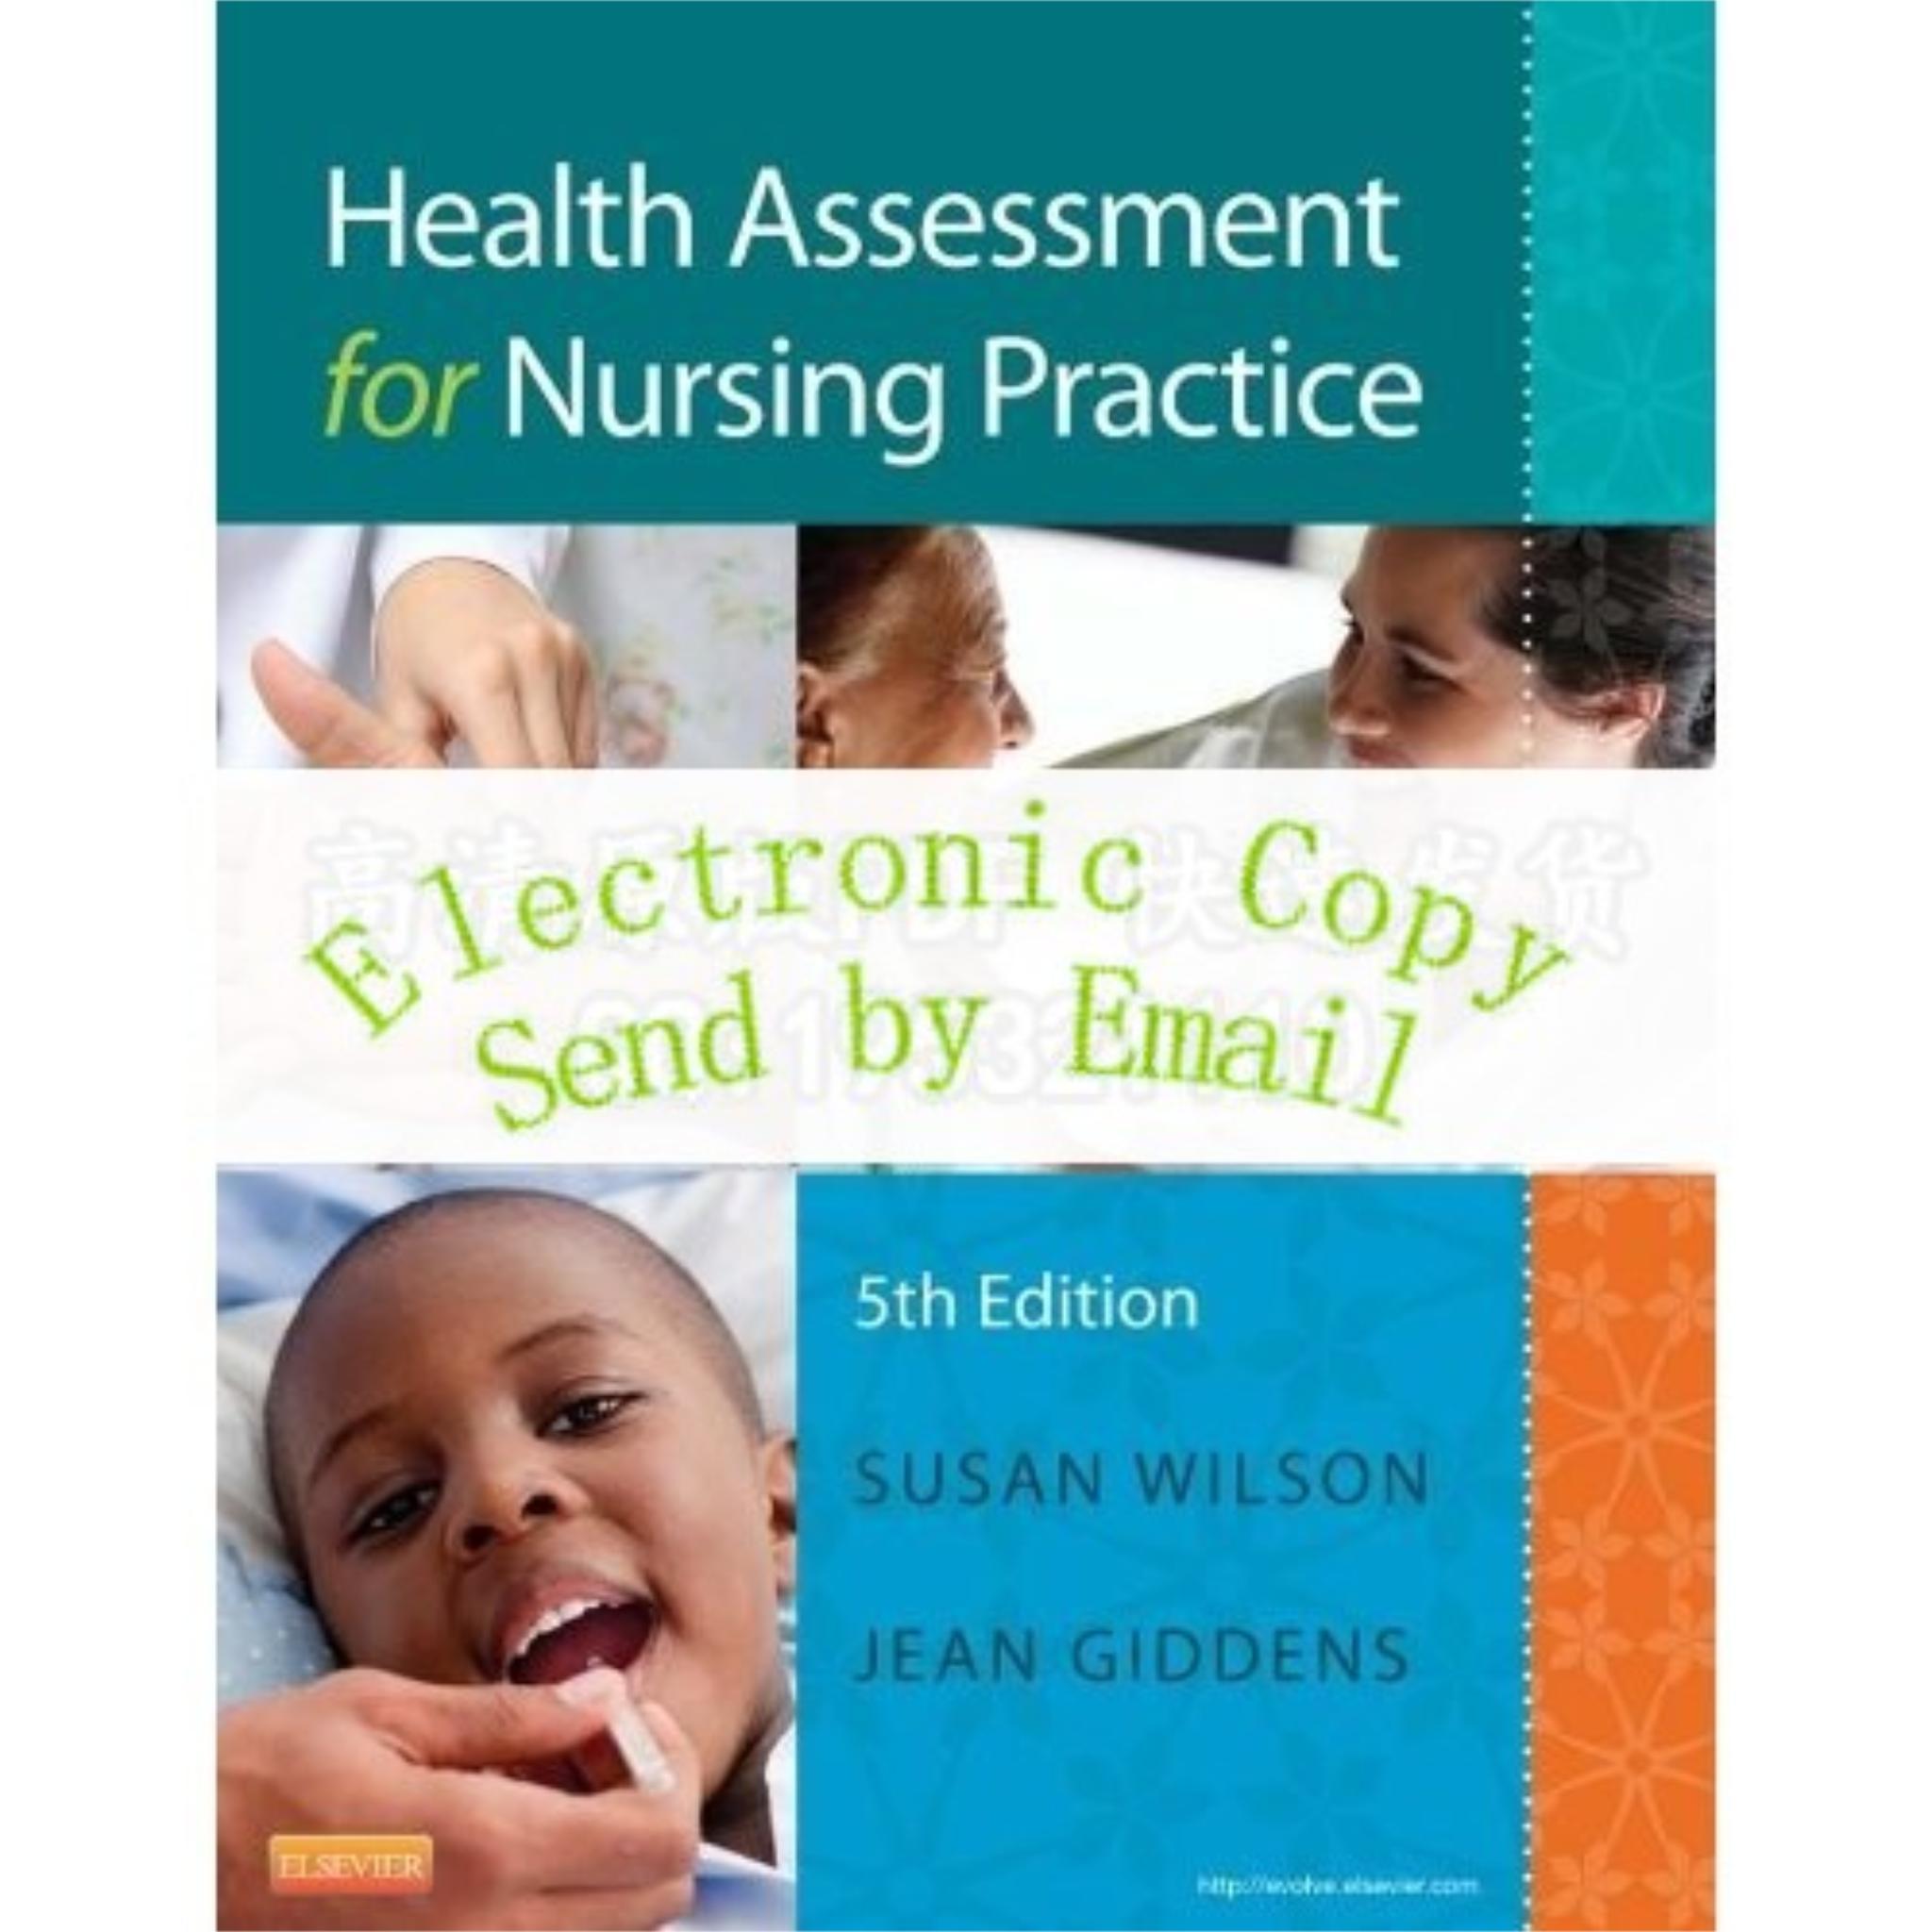 nursing health assessment Nursing assessment 1 part of nursing process 2 nurses use physical assessment skills to: physical examination & health assessment (6th ed.